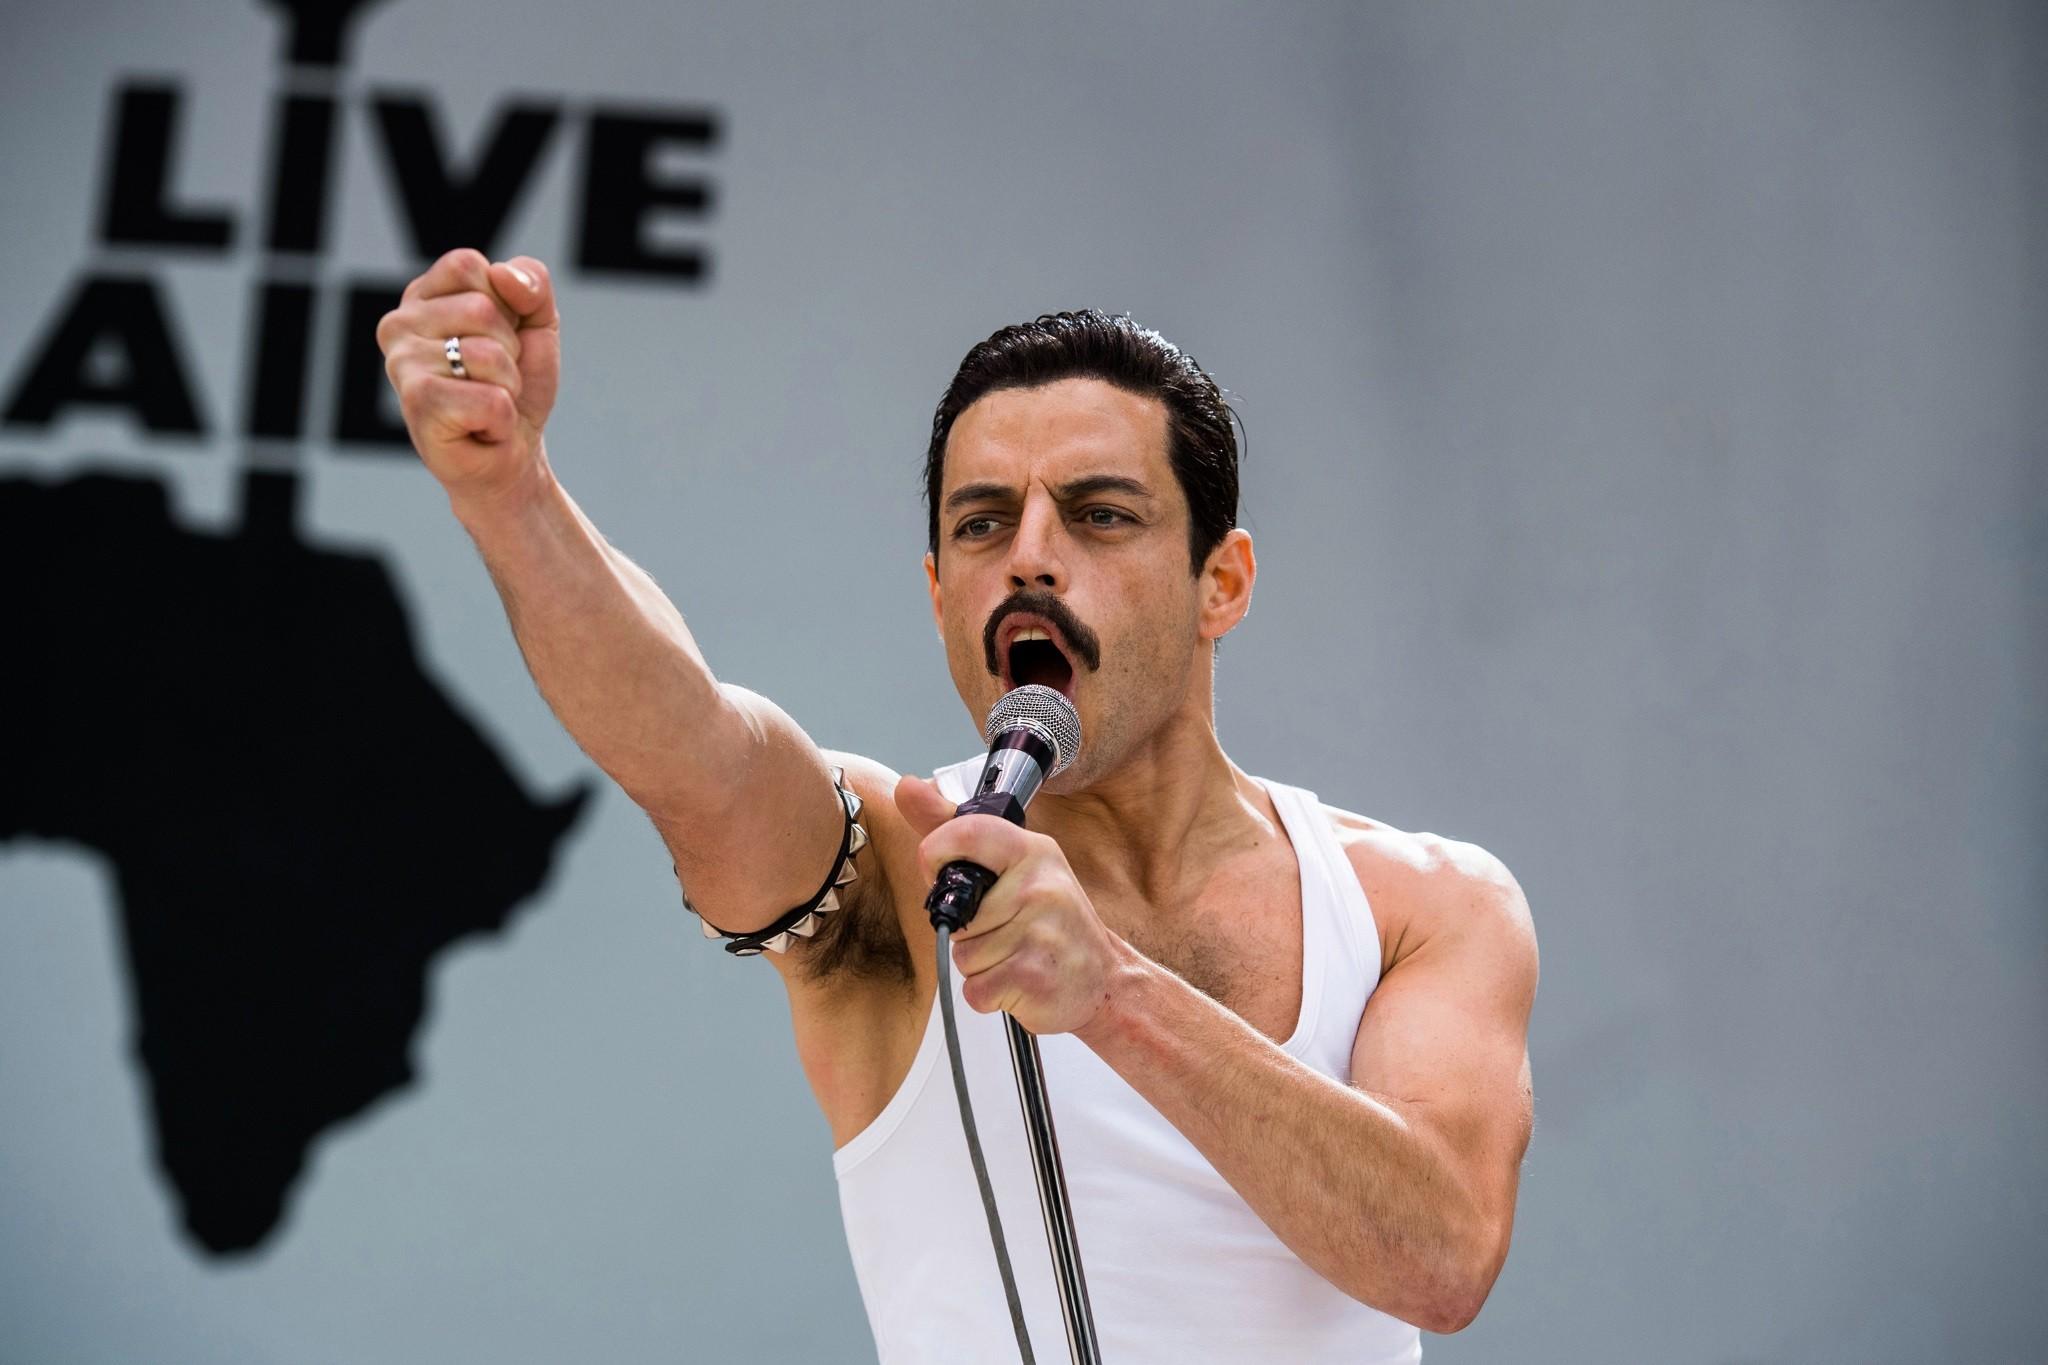 DF-02815_r – Rami Malek stars as Freddie Mercury in Twentieth Century Fox's BOHEMIAN RHAPSODY. Photo Credit: Alex Bailey. - PHOTO CREDIT: ALEX BAILEY